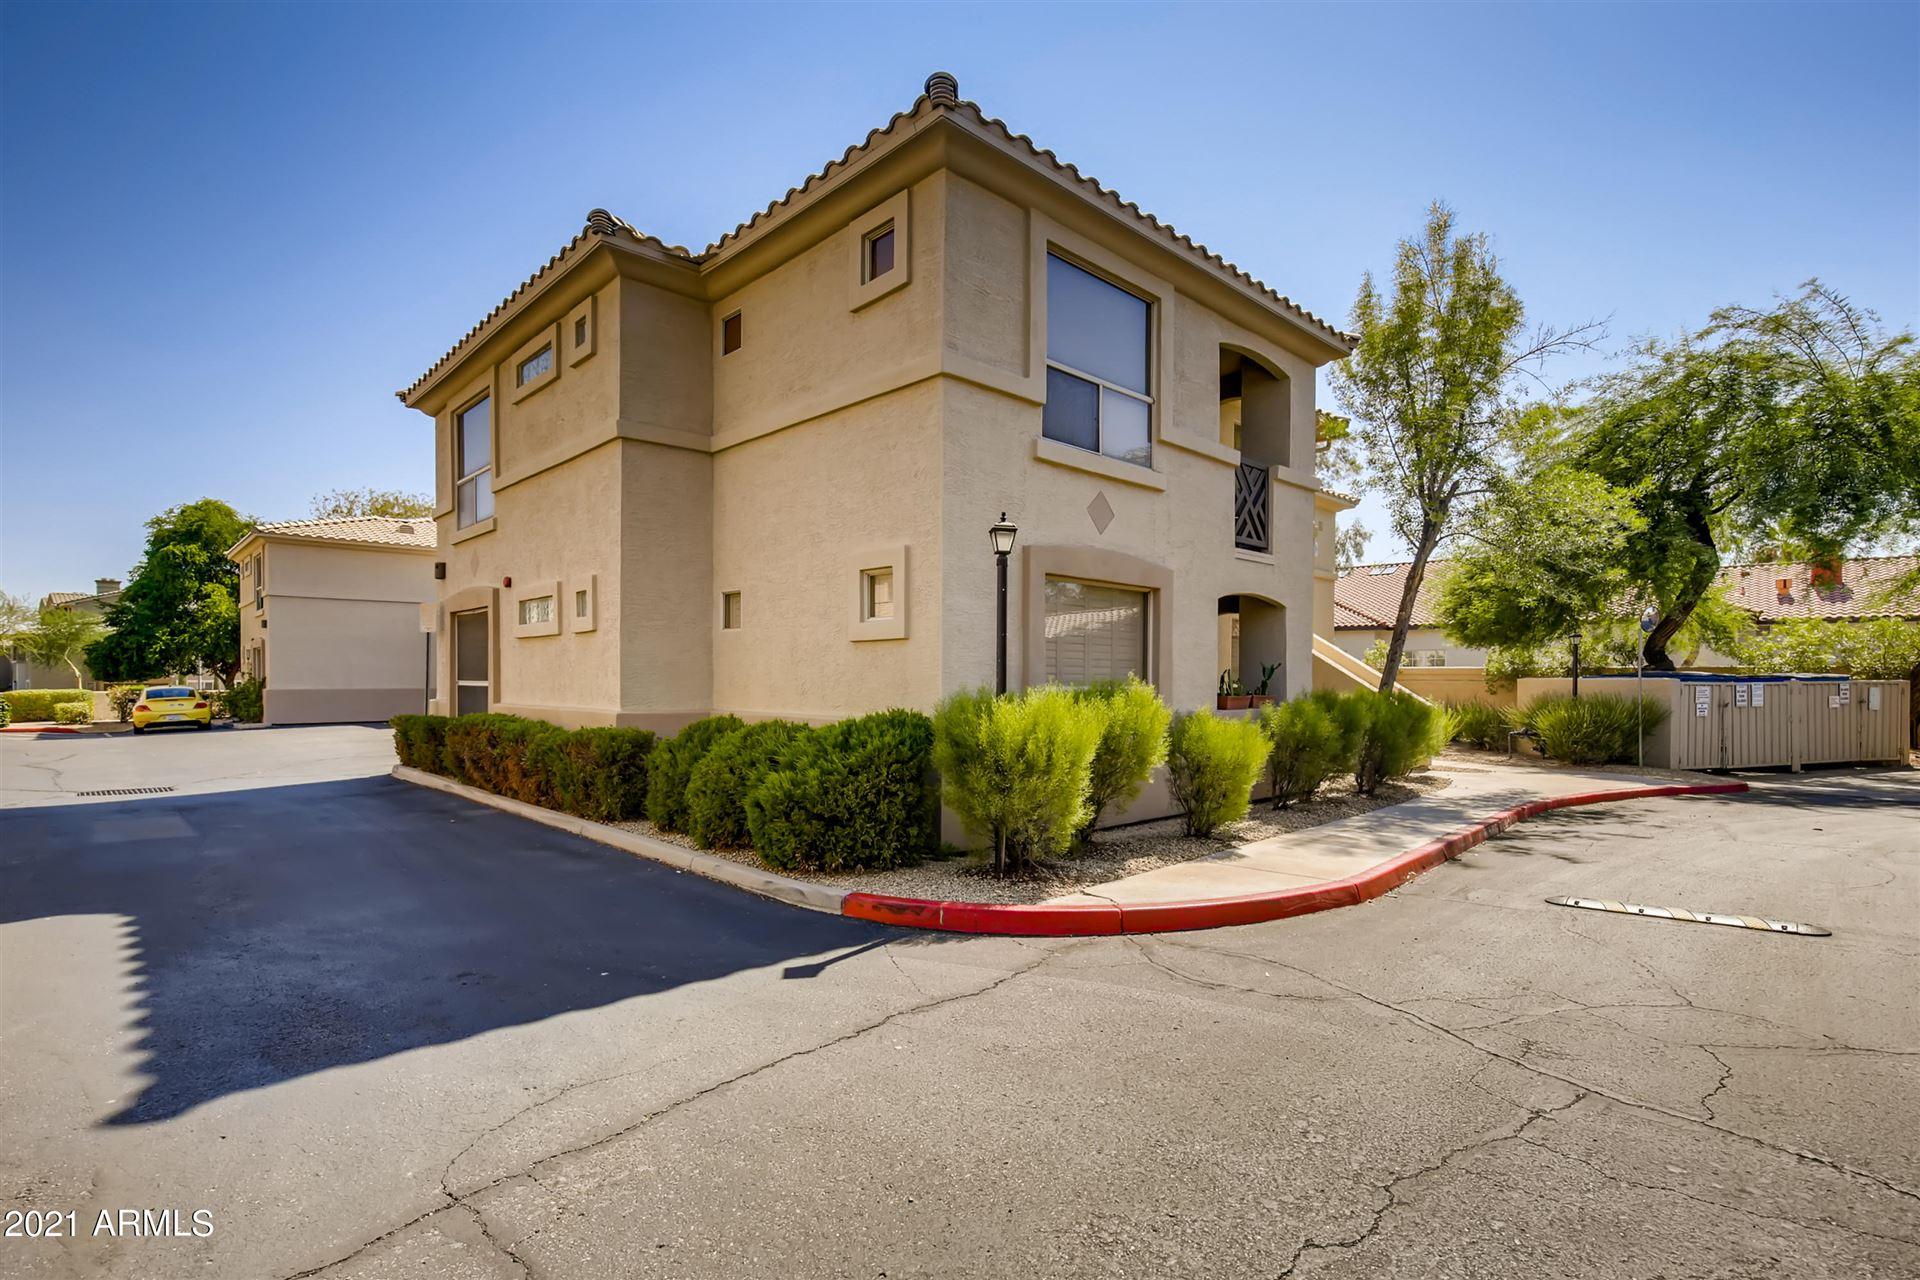 9550 E THUNDERBIRD Road #214, Scottsdale, AZ 85260 - MLS#: 6262564